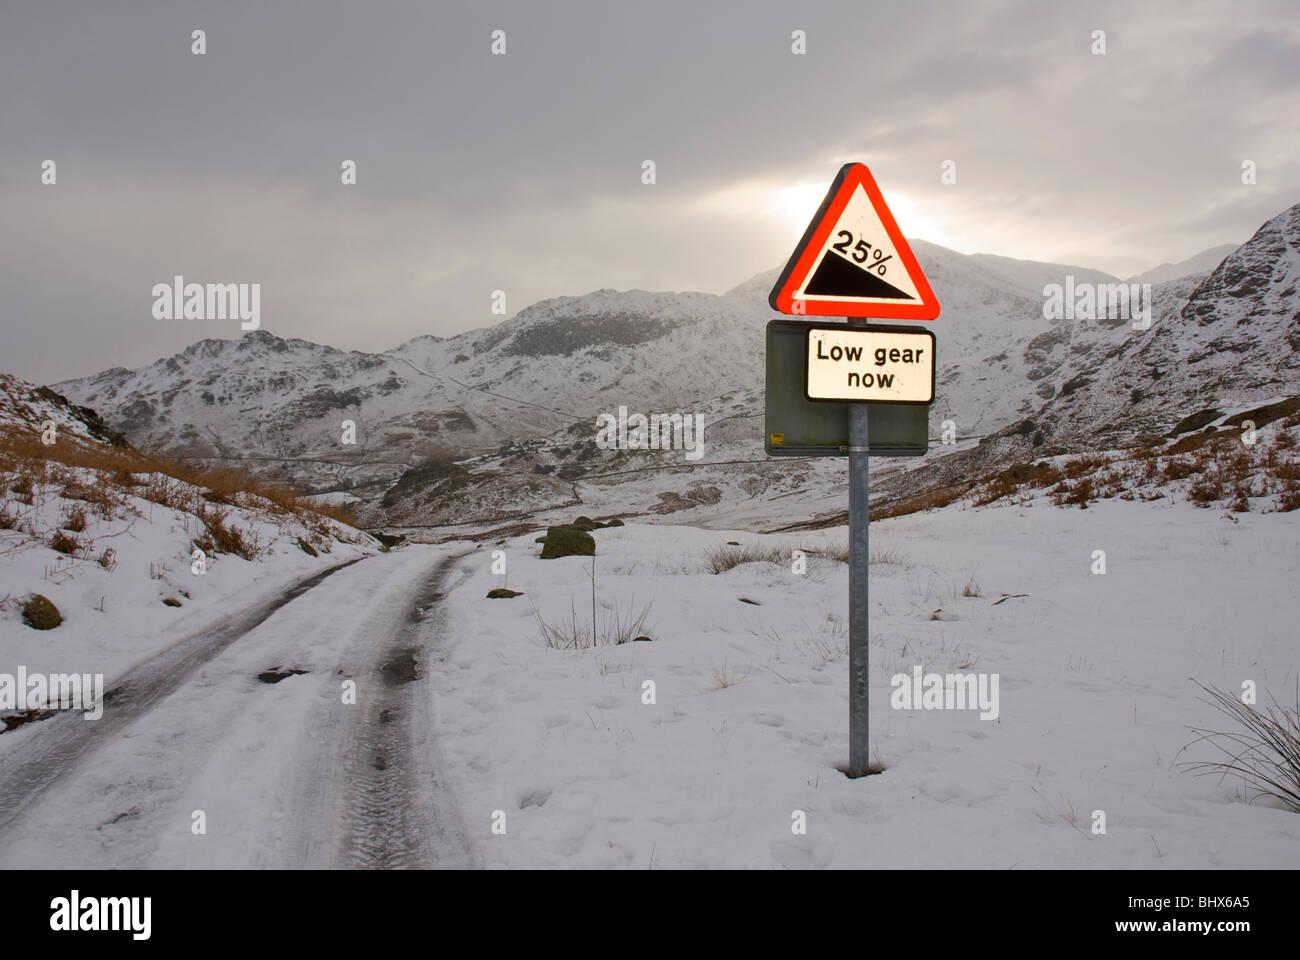 Road sign warning of 1-in-4 gradiant, Little Langdale, Lake District National Park, Cumbria, England UK - Stock Image